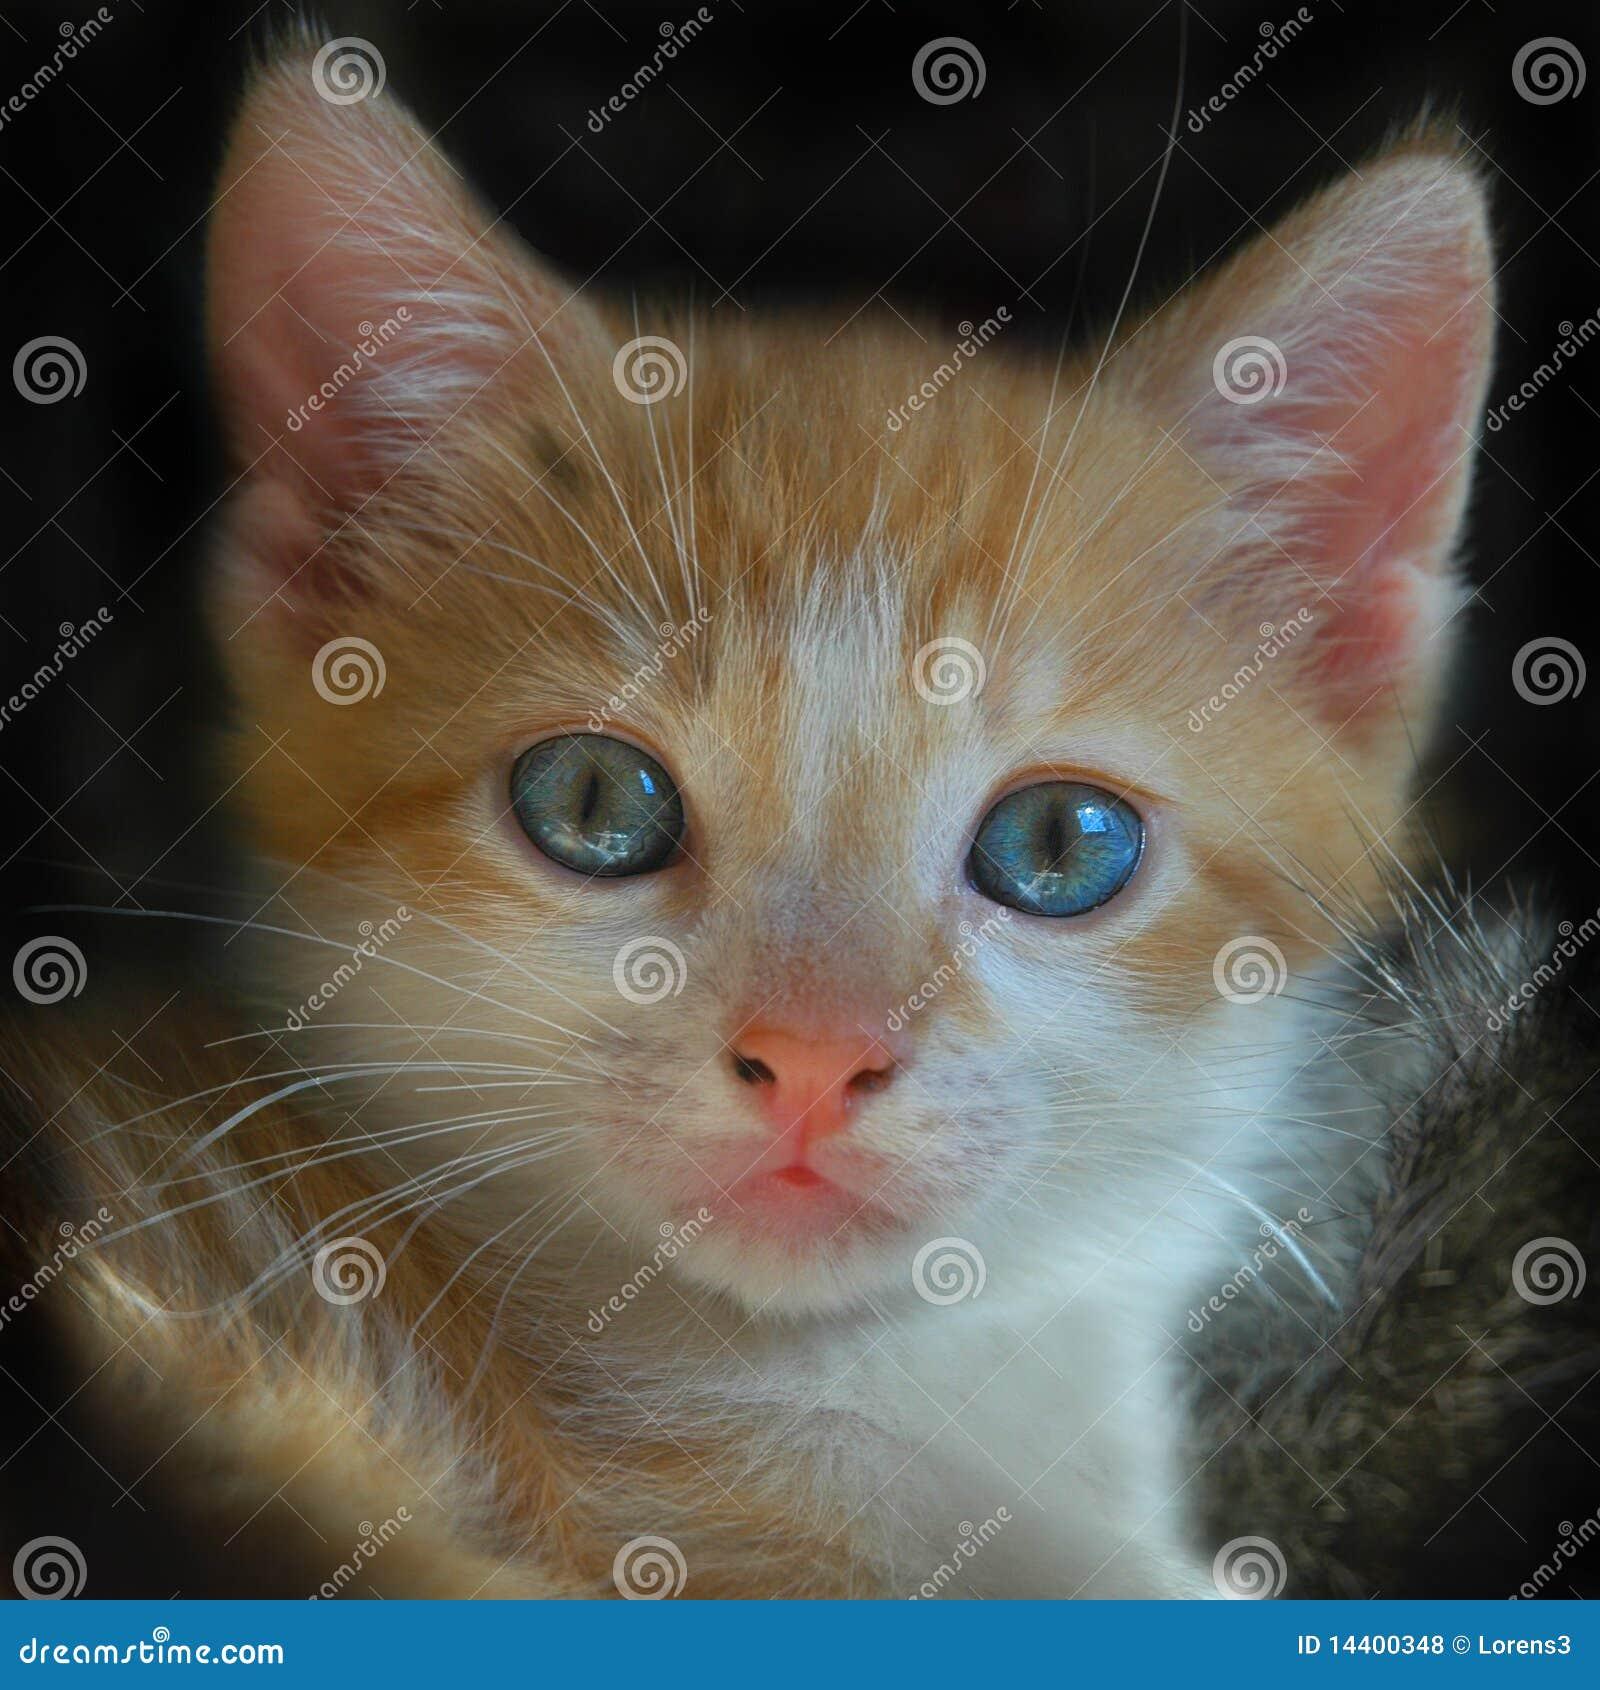 probiotics for kittens